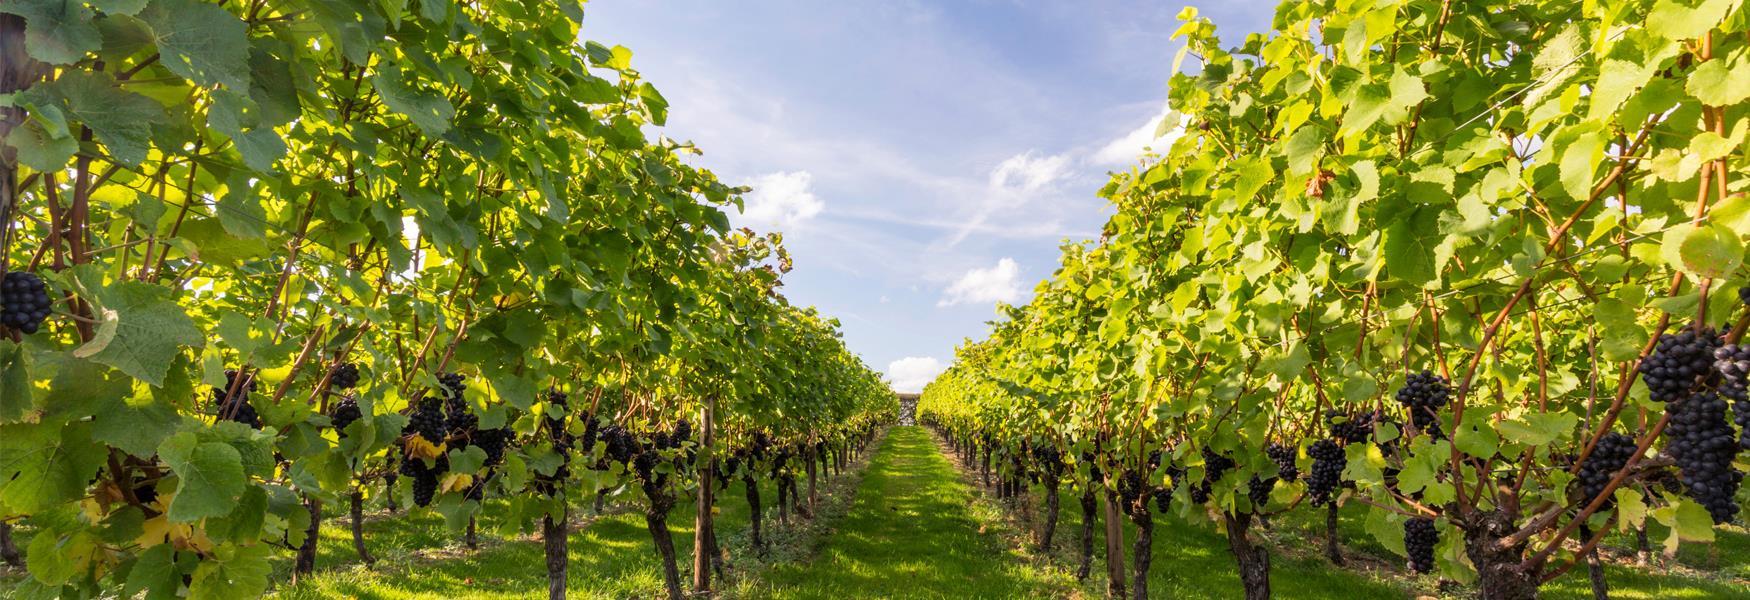 Take a stroll among Hush Heath's Vines